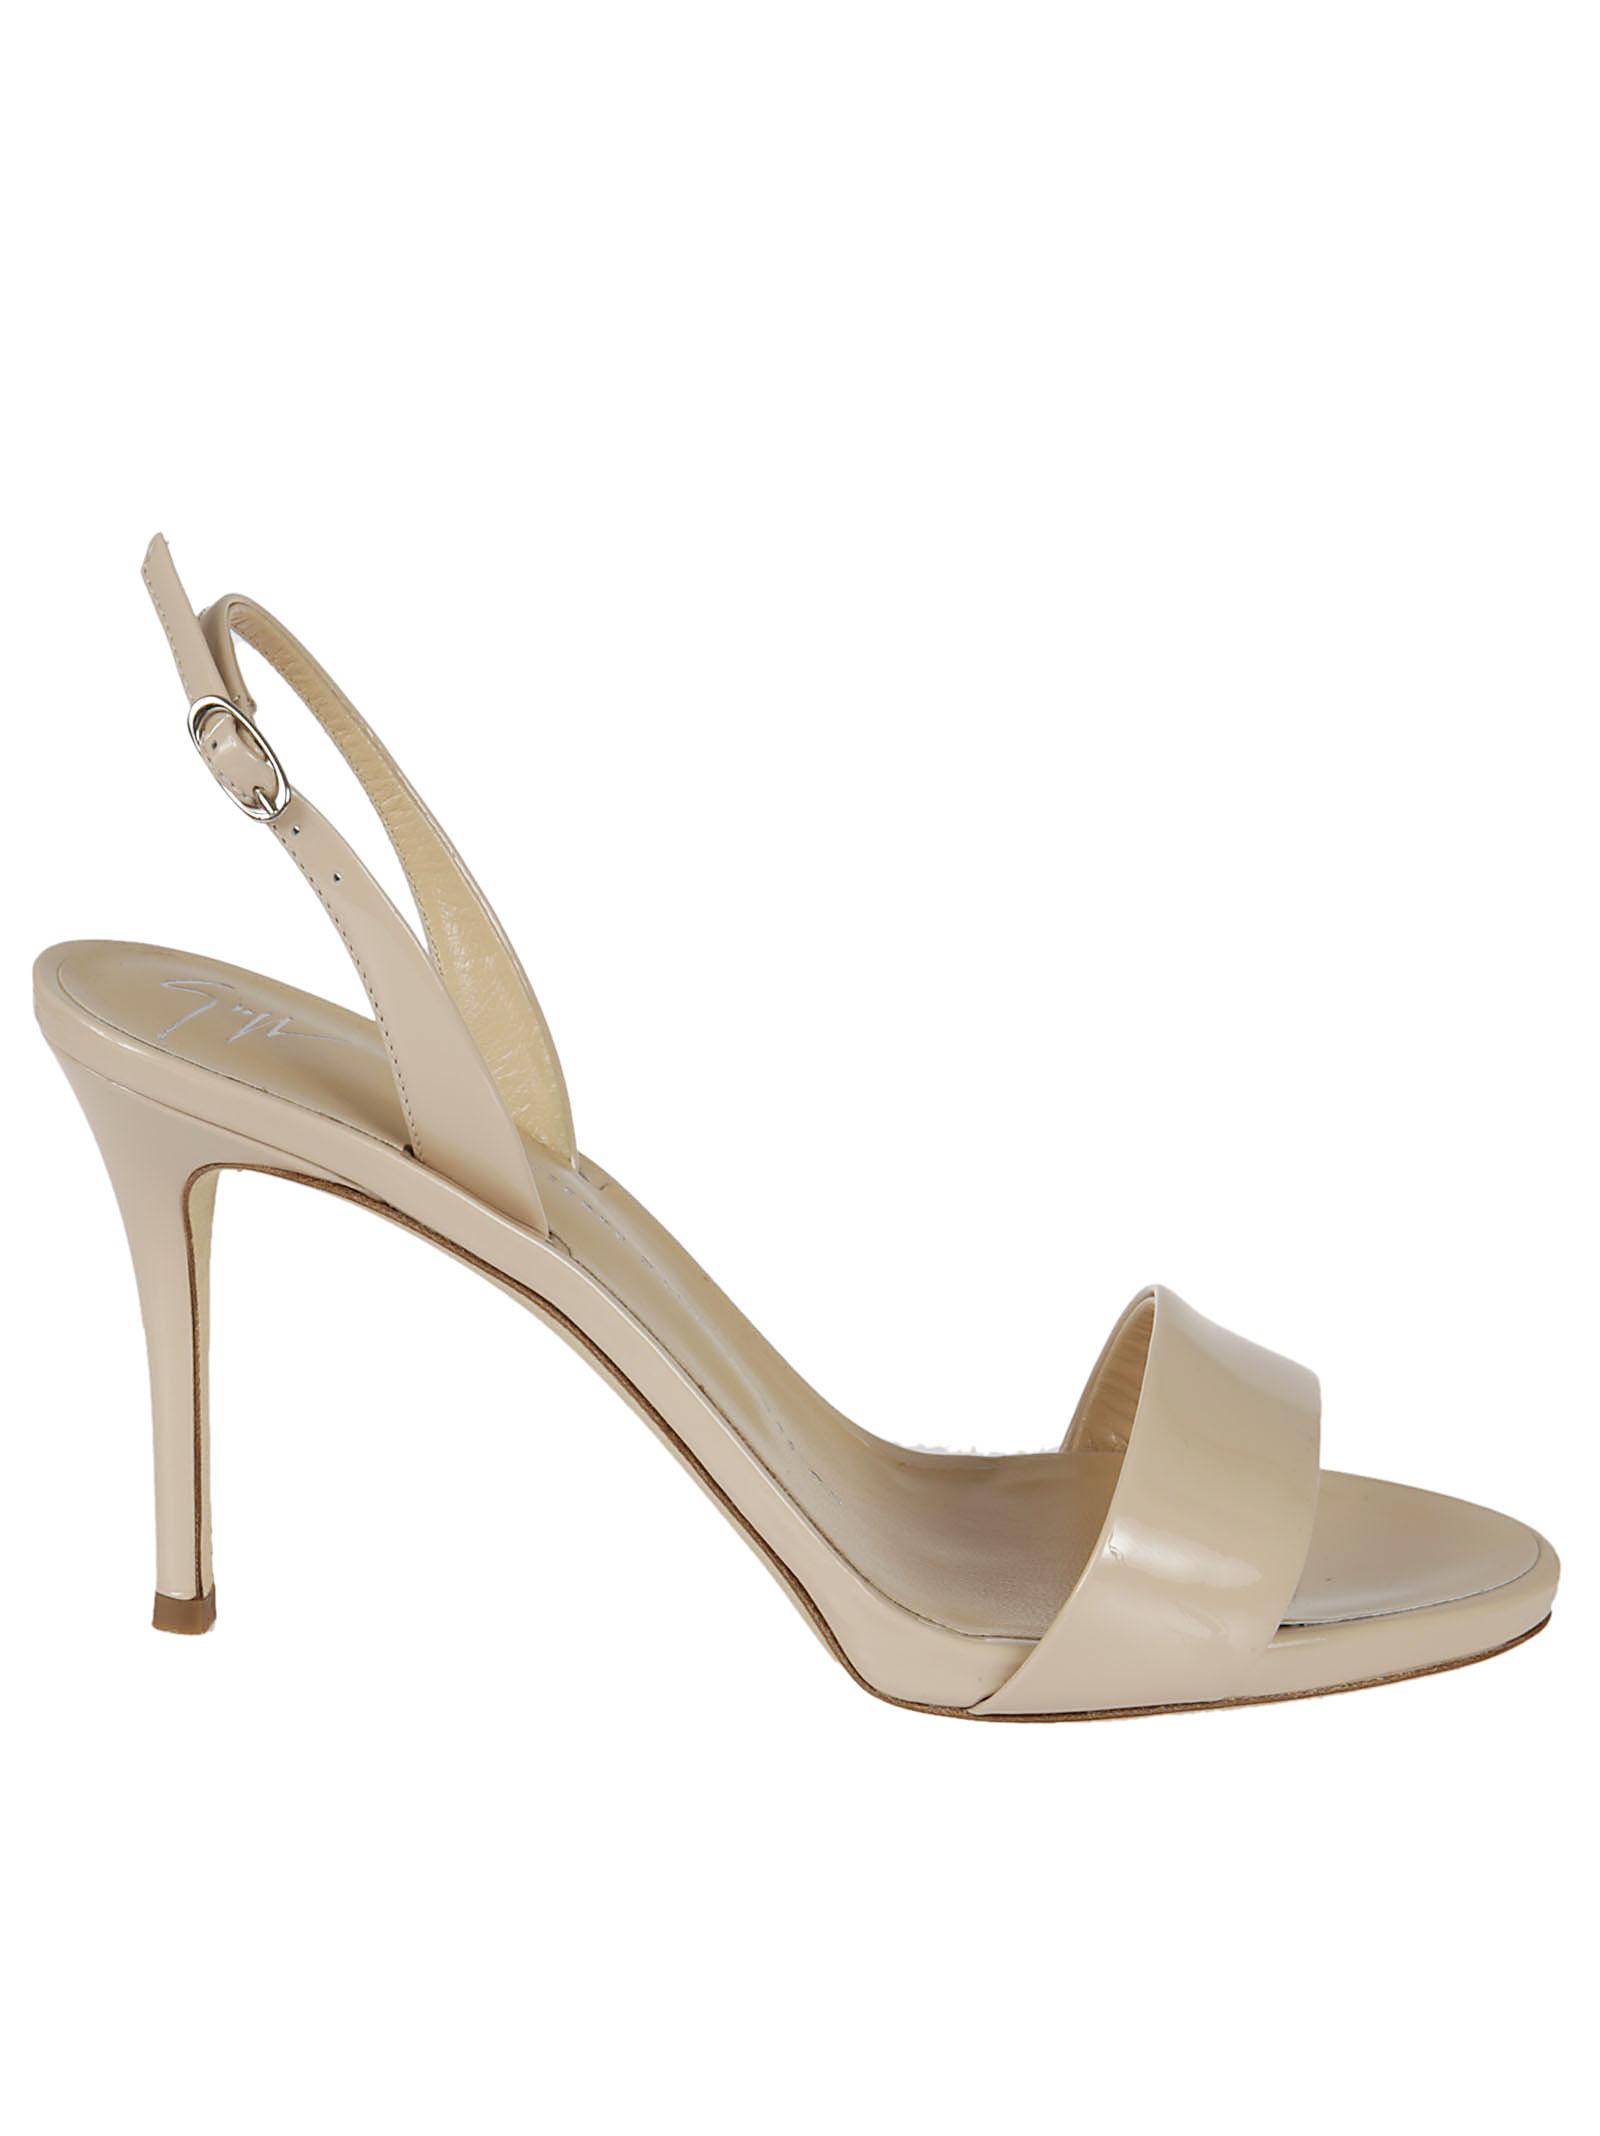 Giuseppe Zanotti Giuseppe Zanotti Leather Sandals